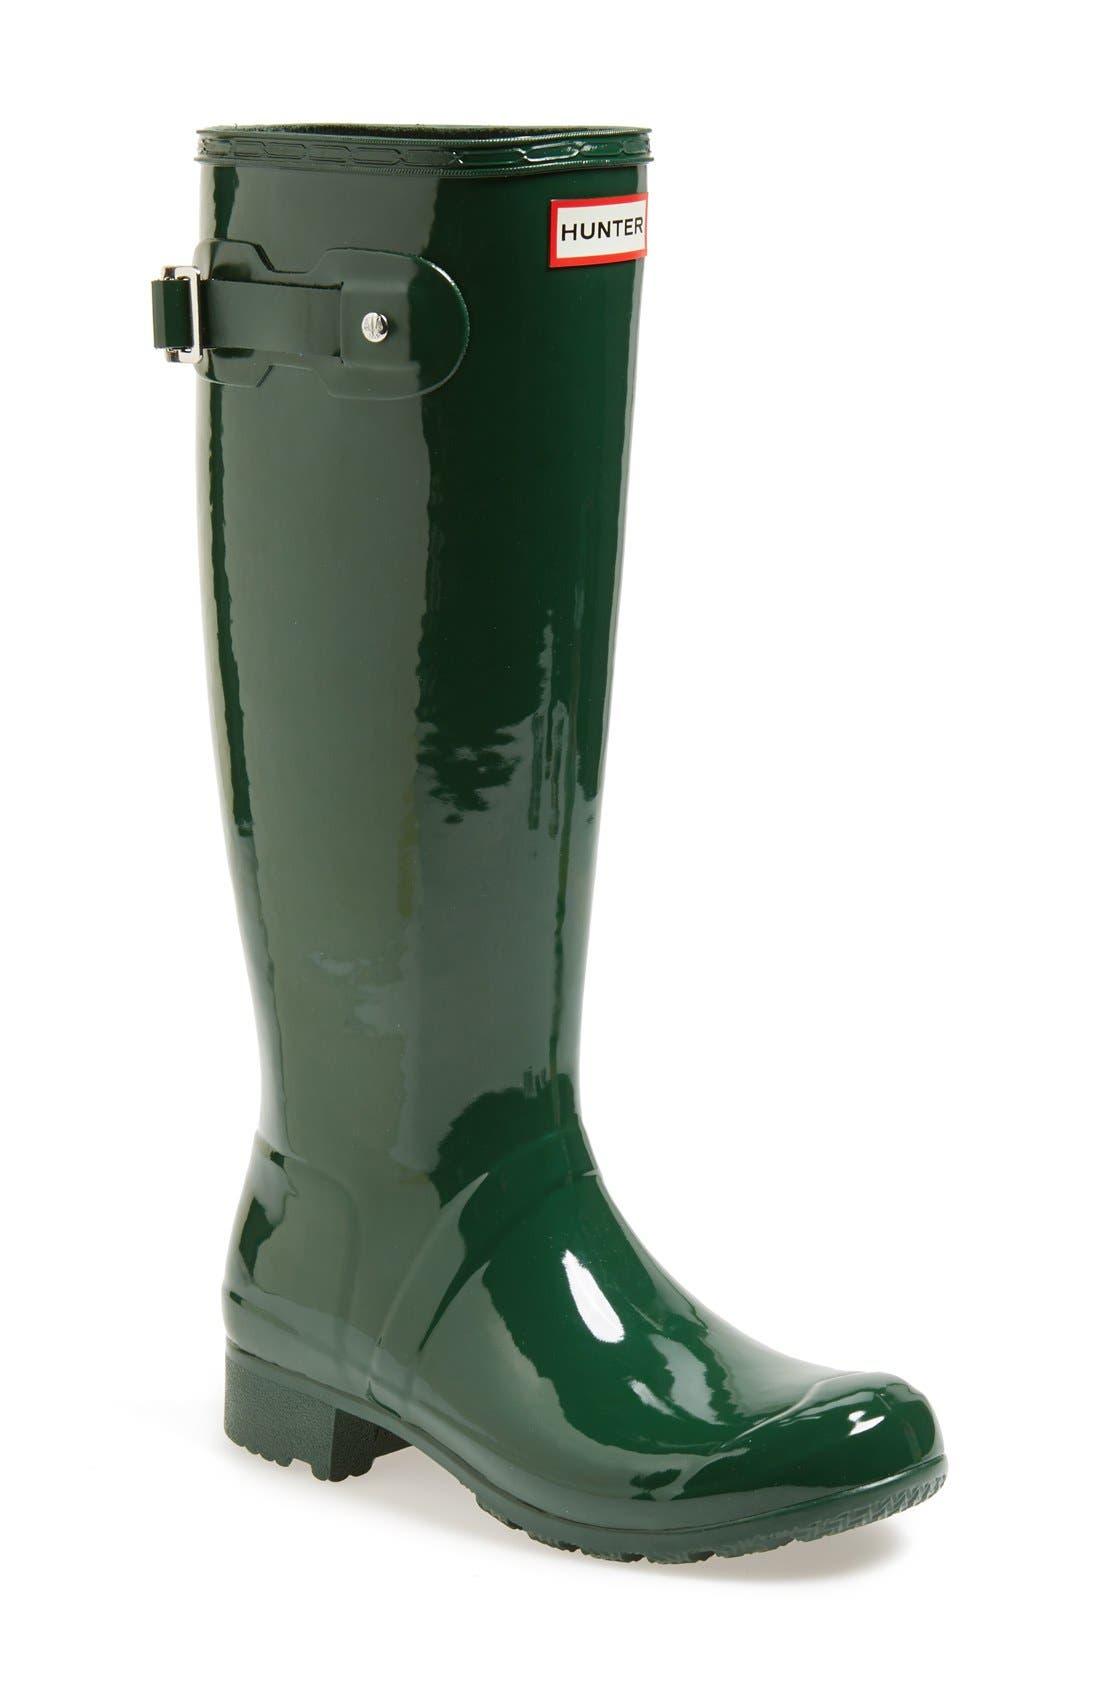 Alternate Image 1 Selected - Hunter Original Tour Gloss Packable Rain Boot (Women)